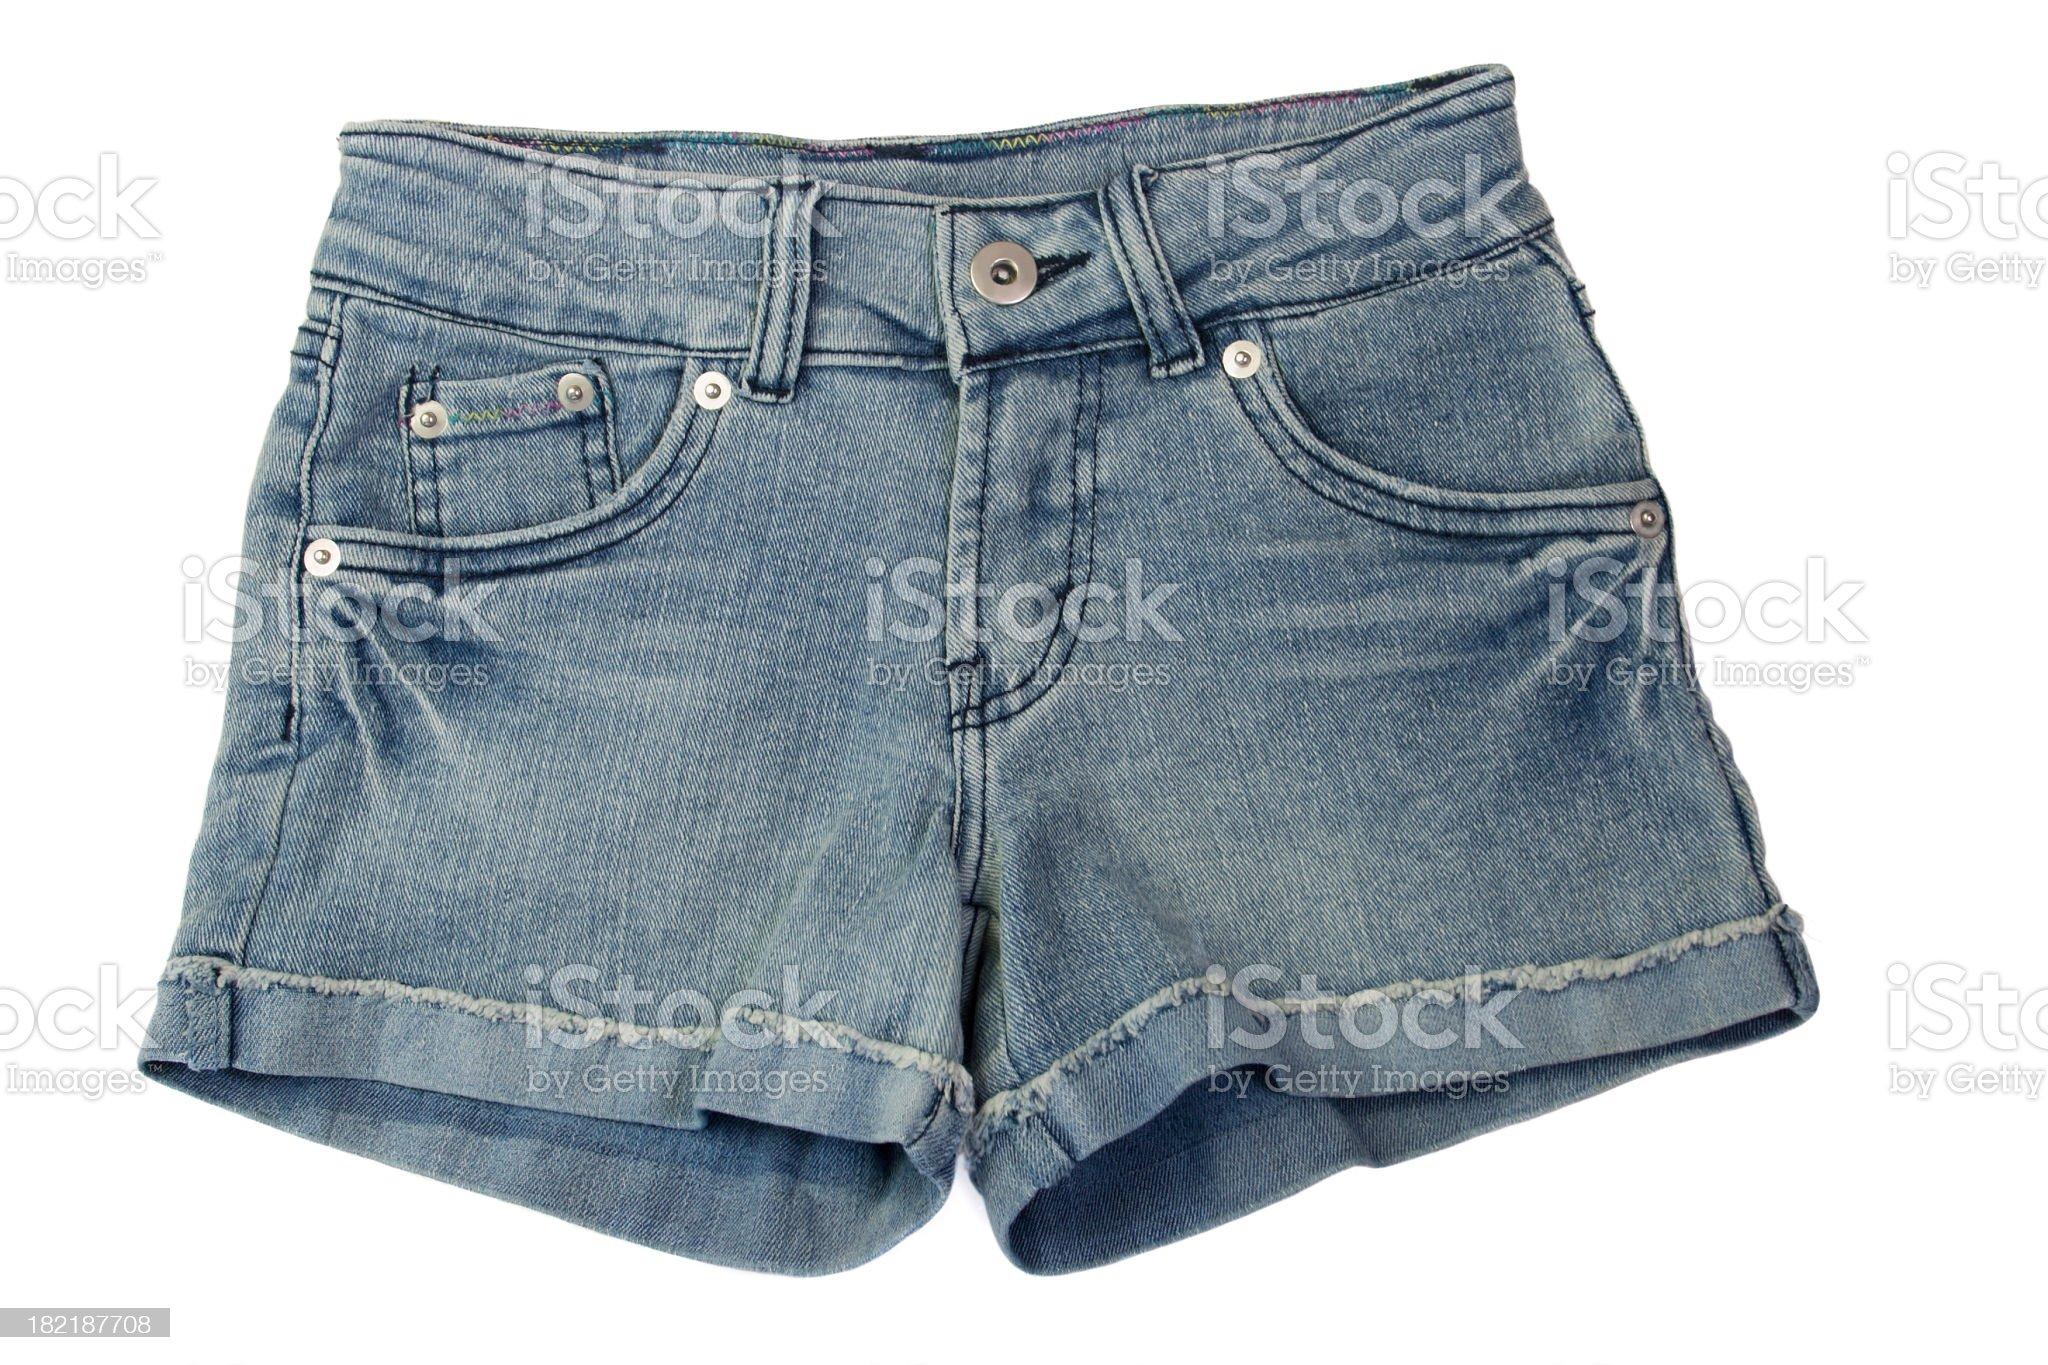 Closeup photograph of denim shorts royalty-free stock photo